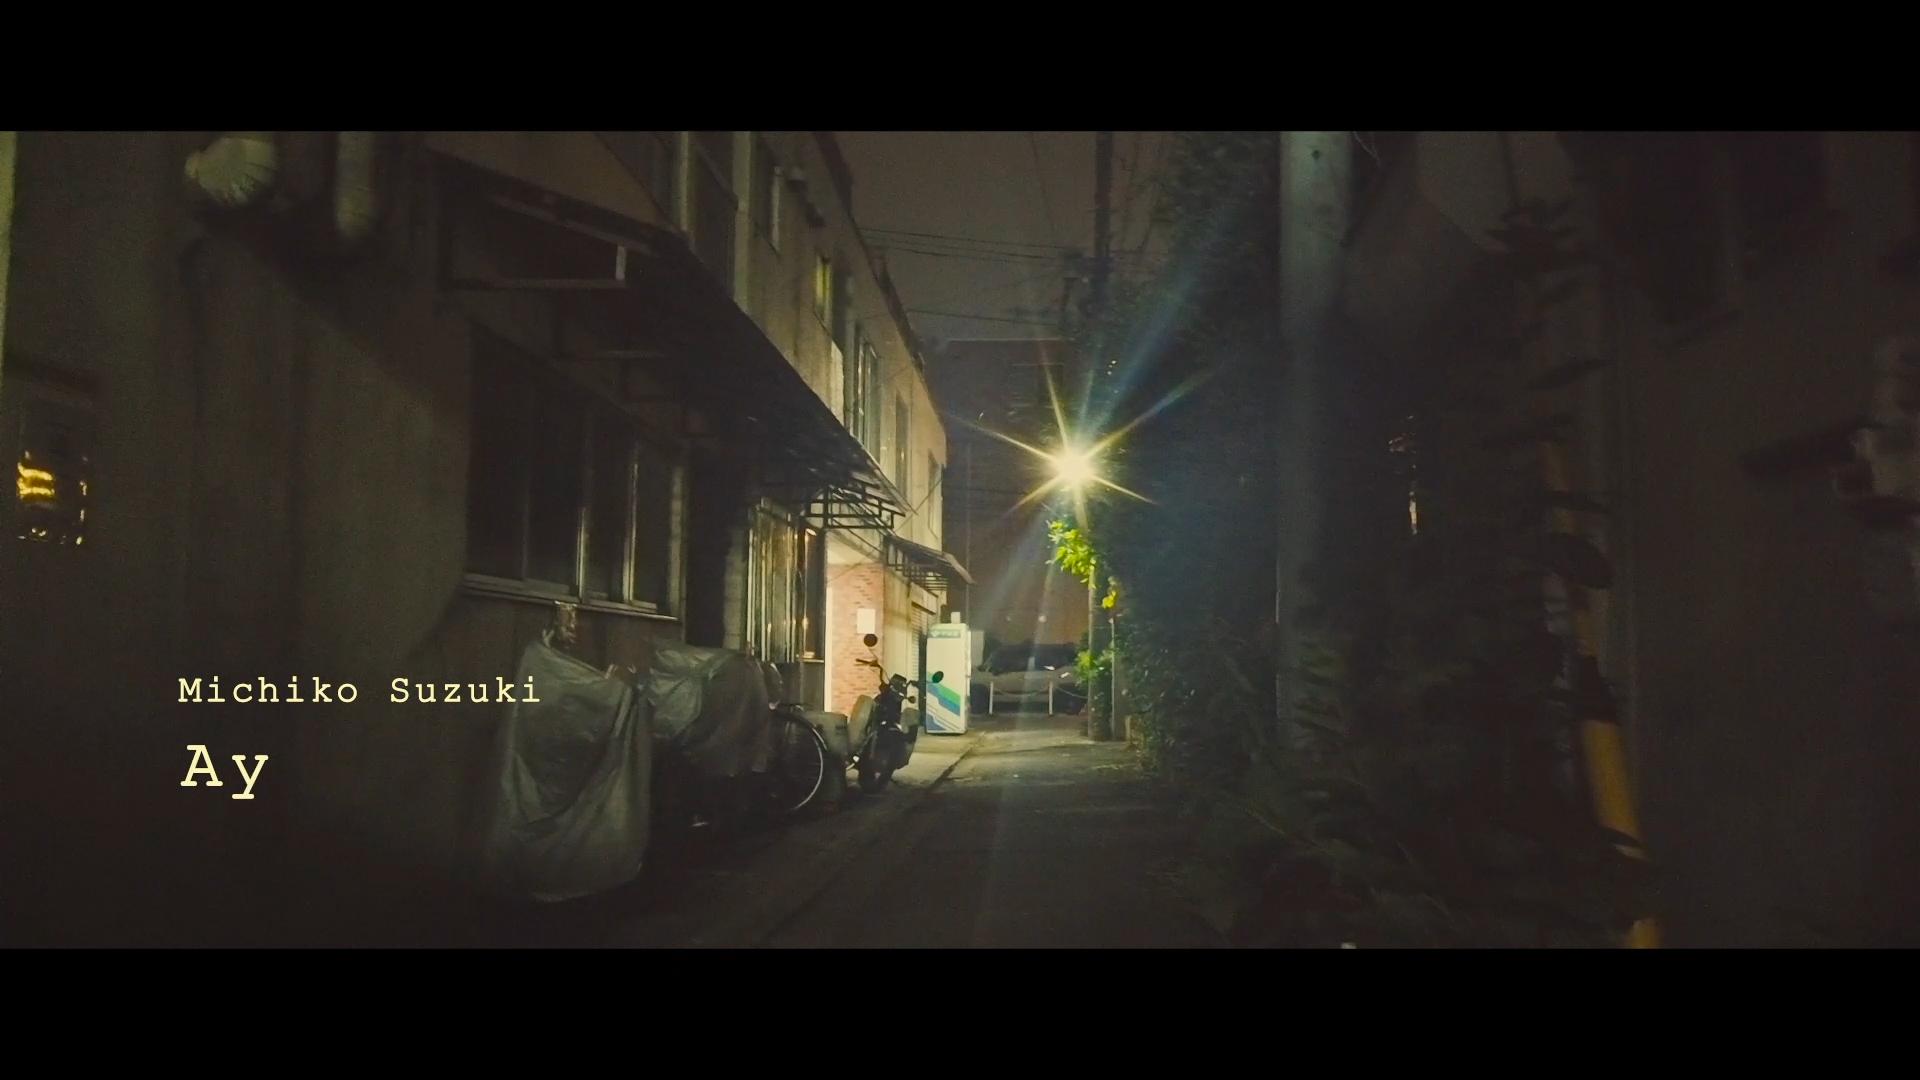 【MV】Ay - 鈴木未知子(Michiko Suzuki) - My RØDE Reel 2020-